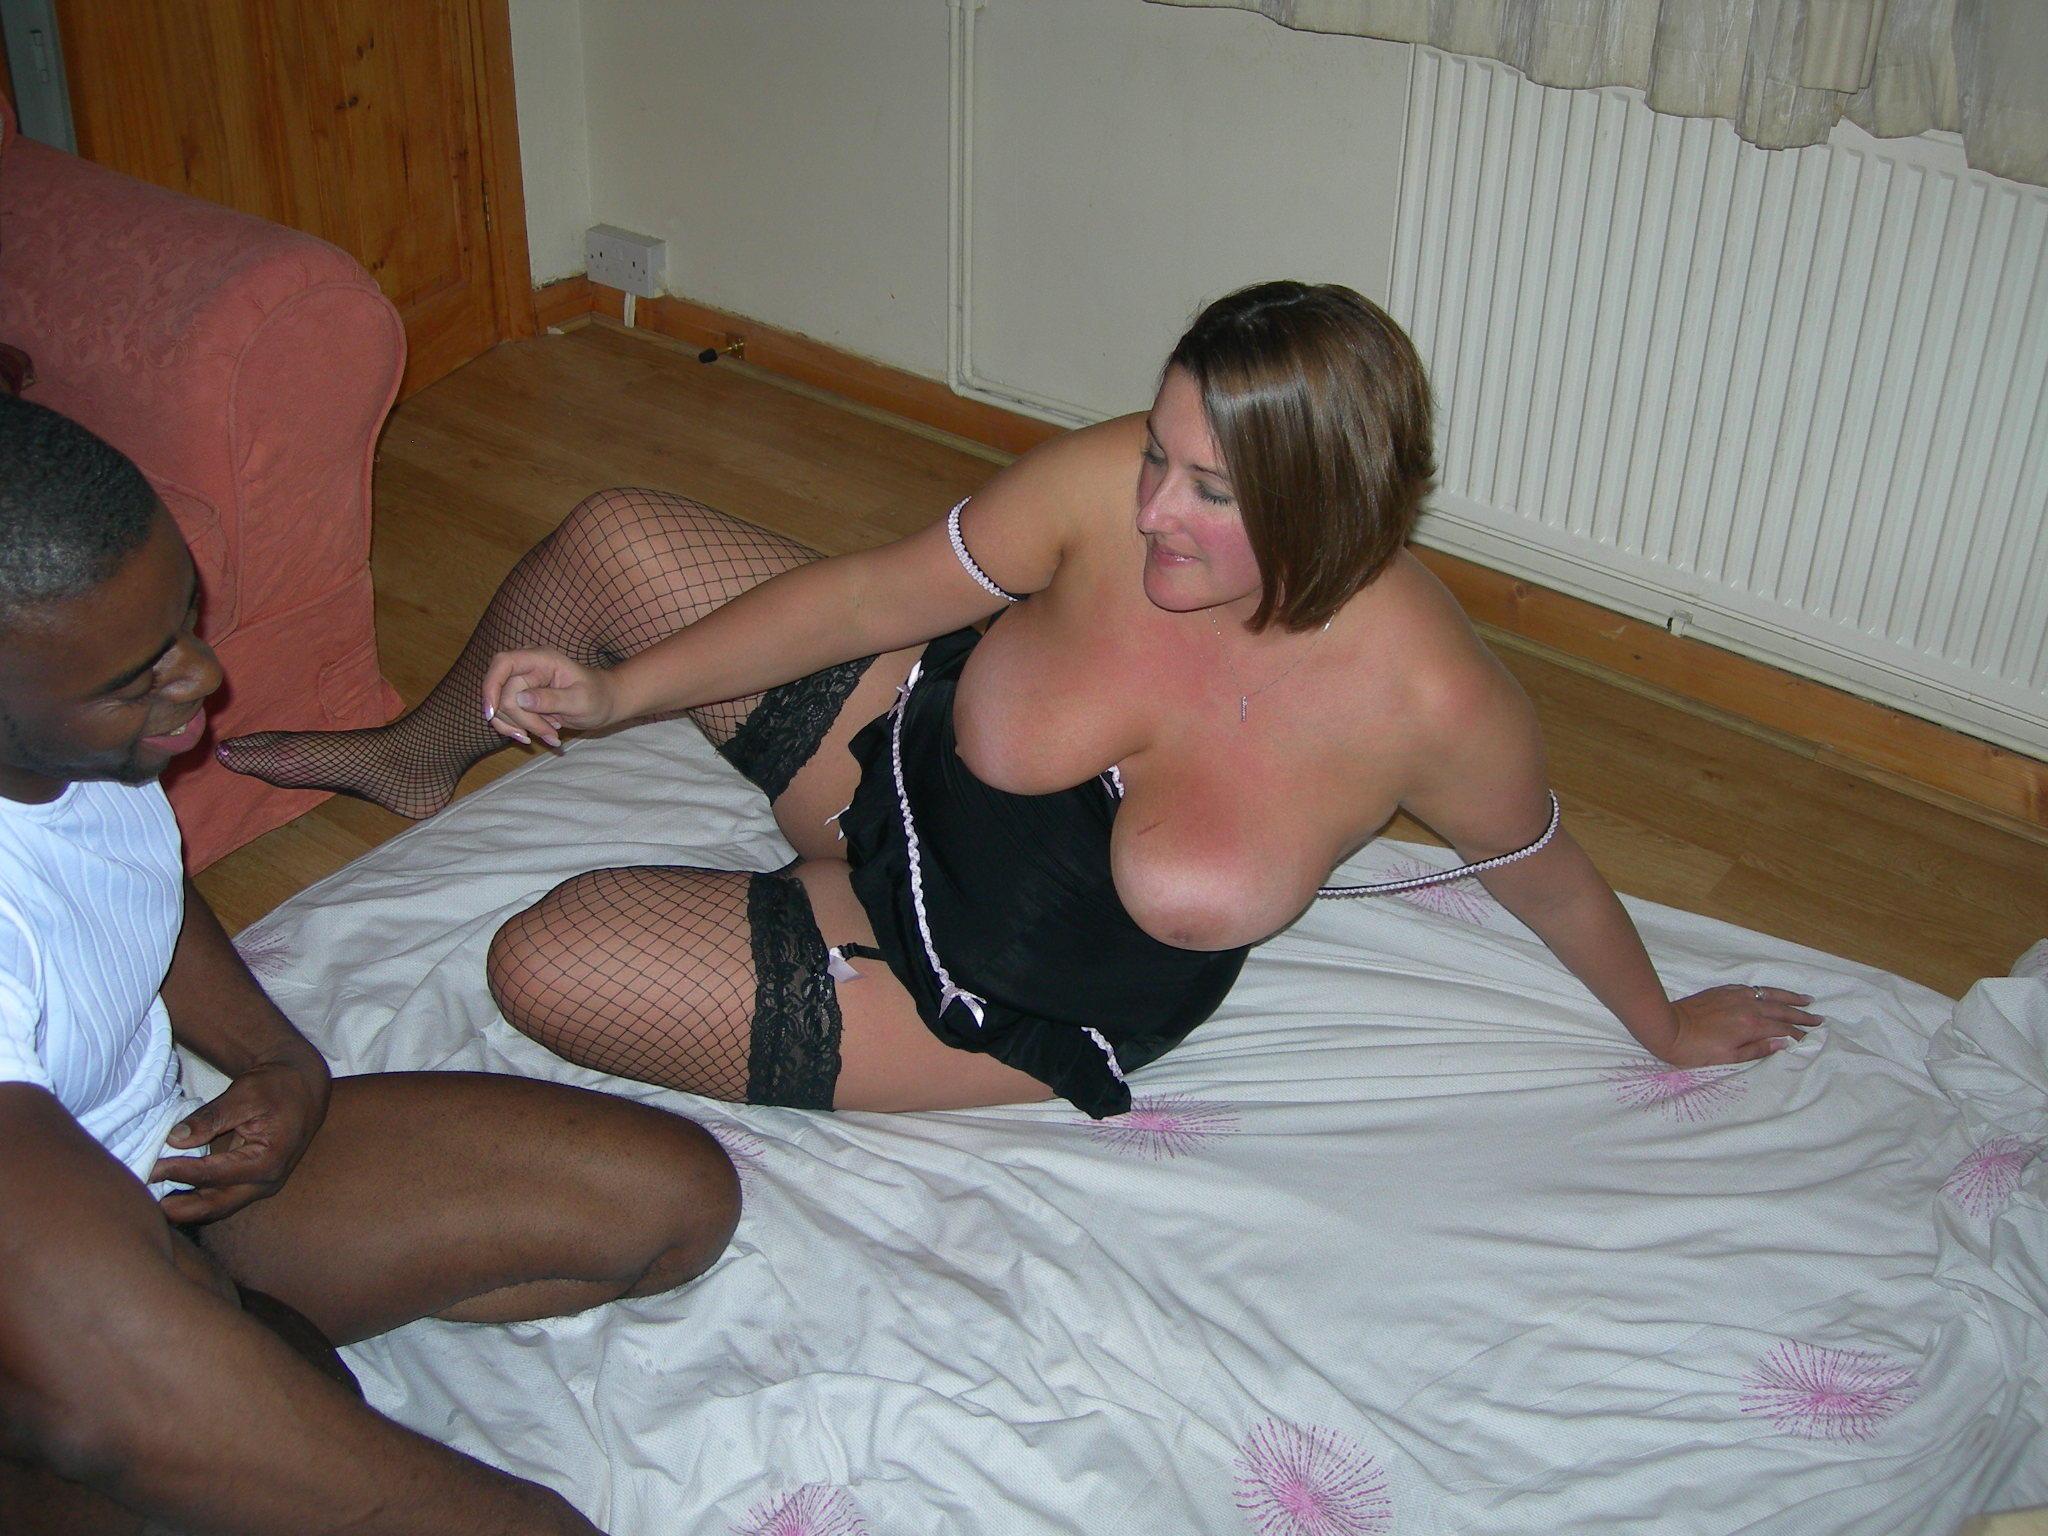 Bra panty bbw pantyhose cleavage